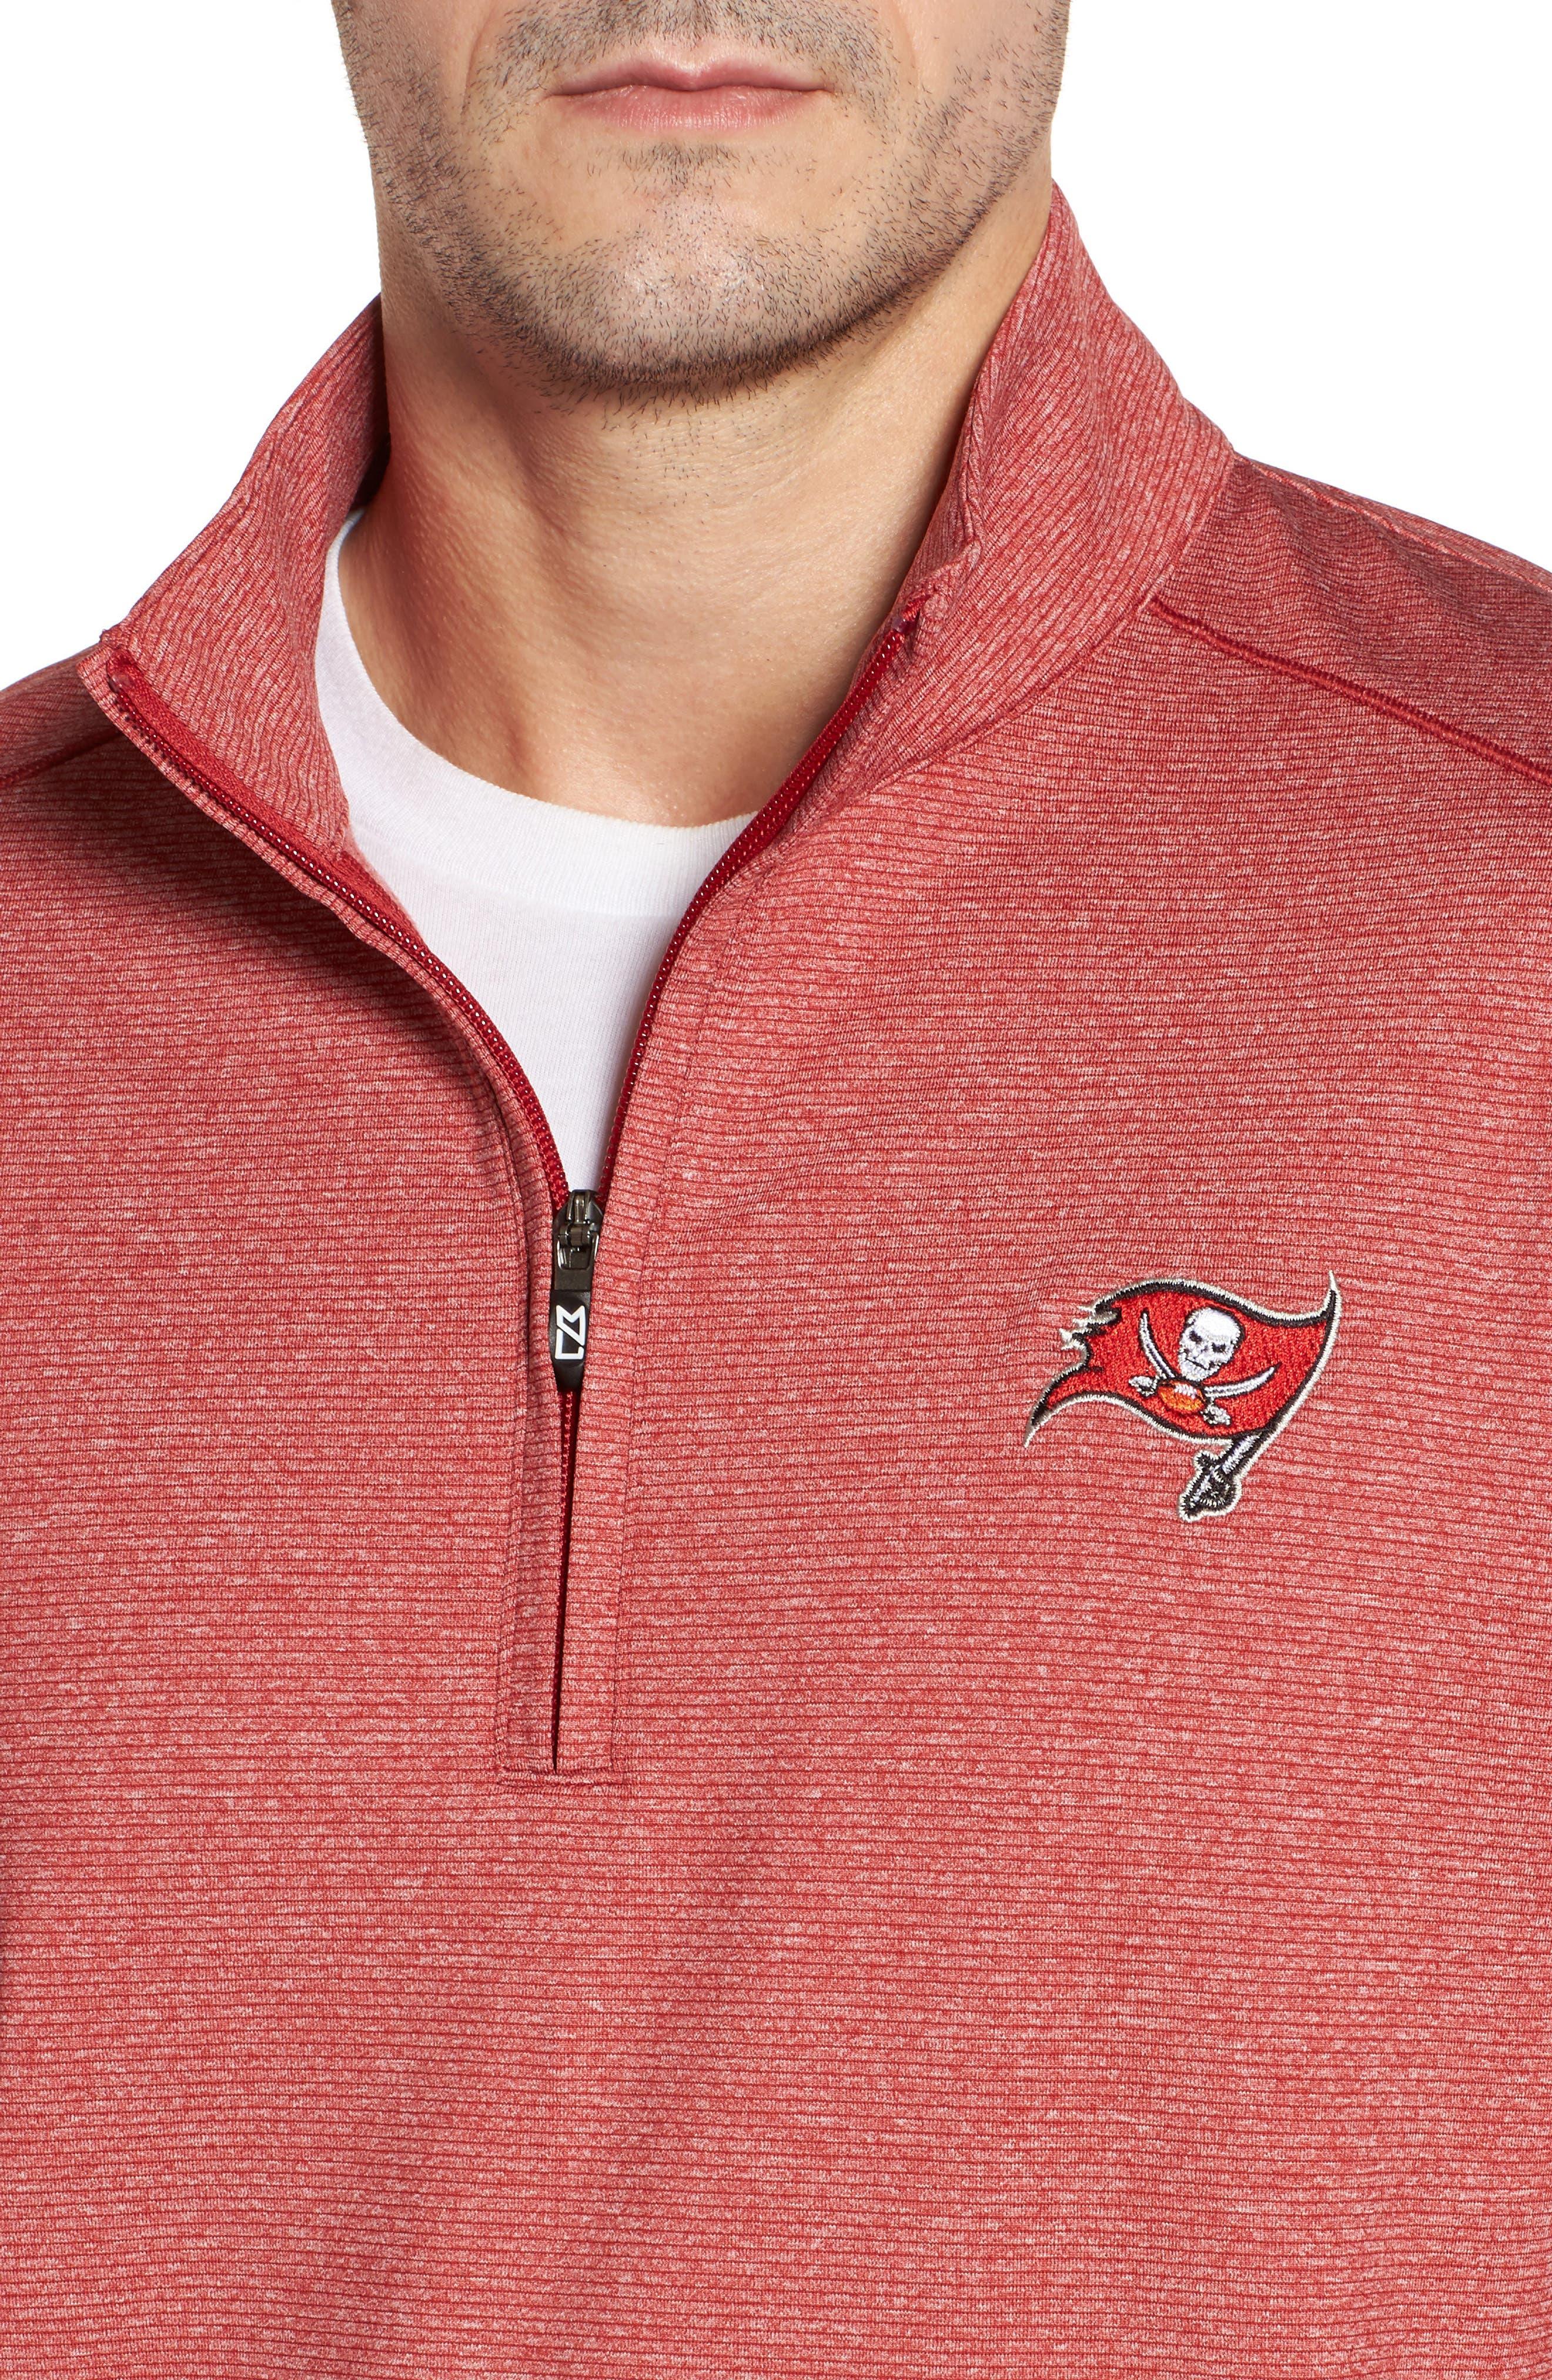 Shoreline - Tampa Bay Buccaneers Half Zip Pullover,                             Alternate thumbnail 4, color,                             Cardinal Red Heather